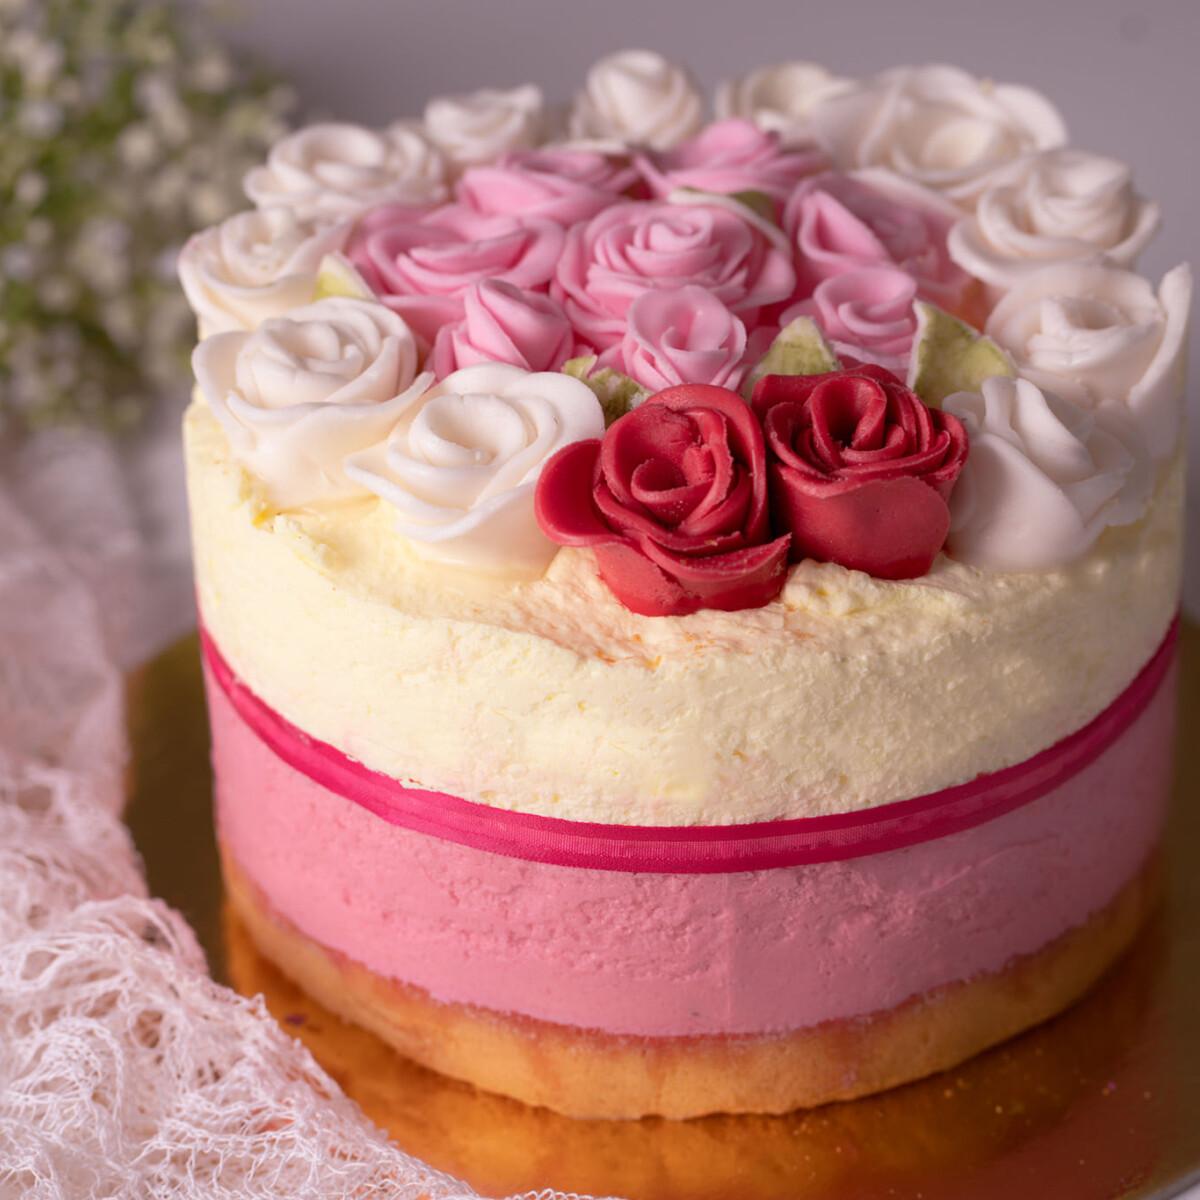 Ezen a képen: Eper-bodza mousse torta